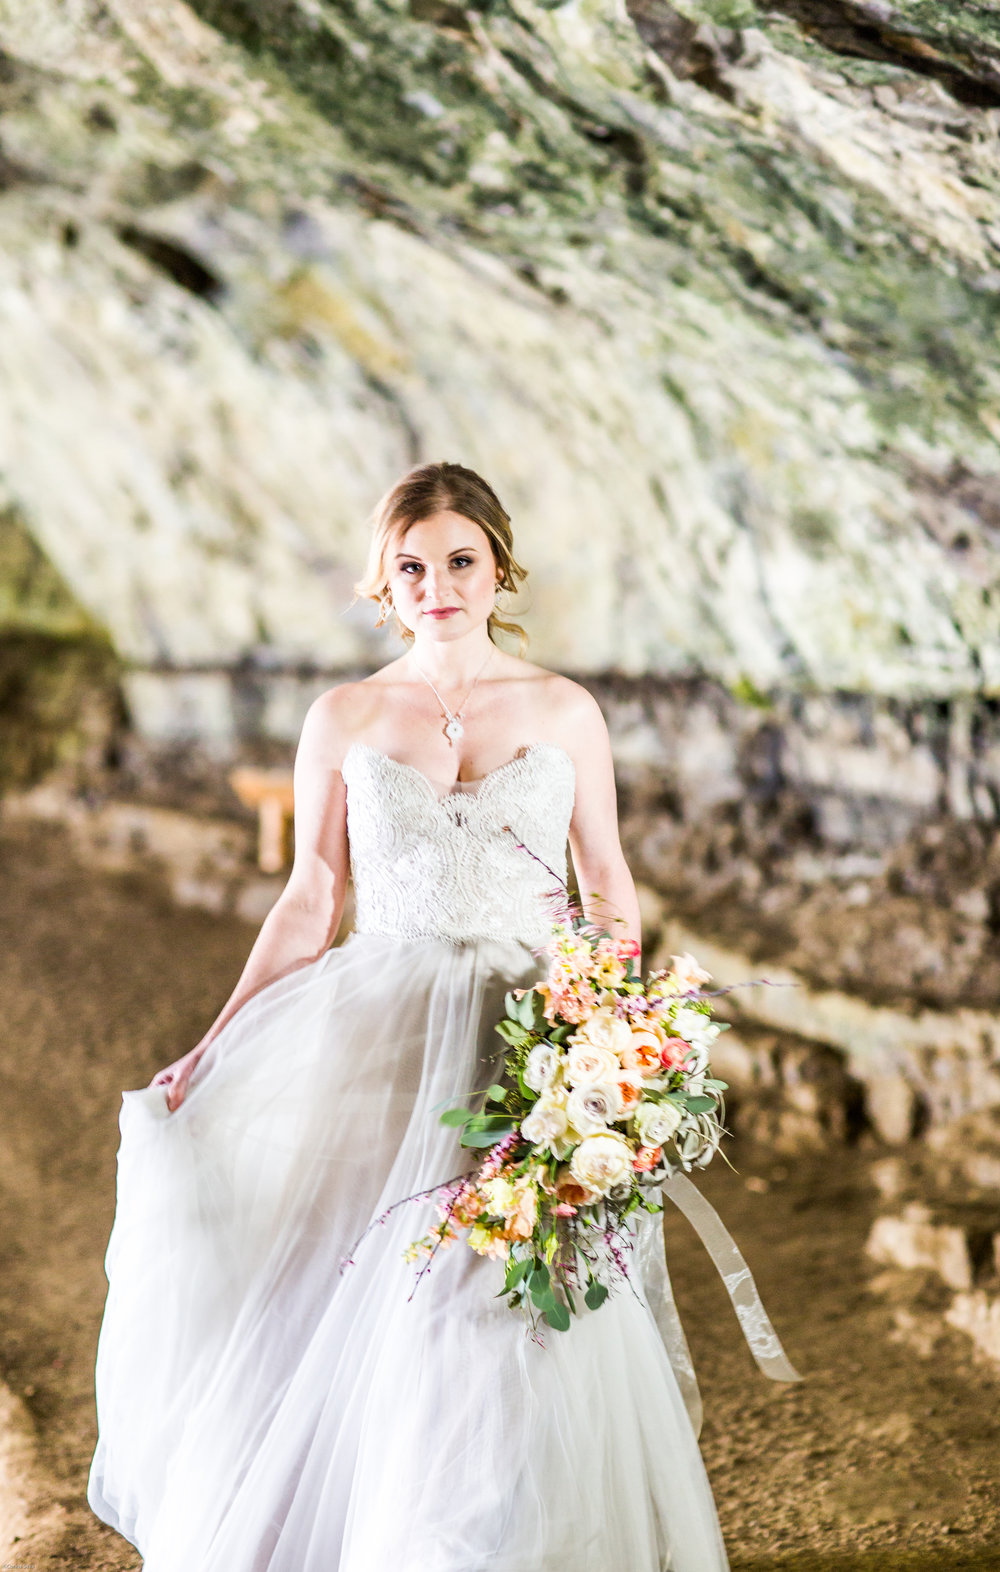 Silver Falls-elopement-bride-and-groom-photo Corina Silva Studios-39.jpg